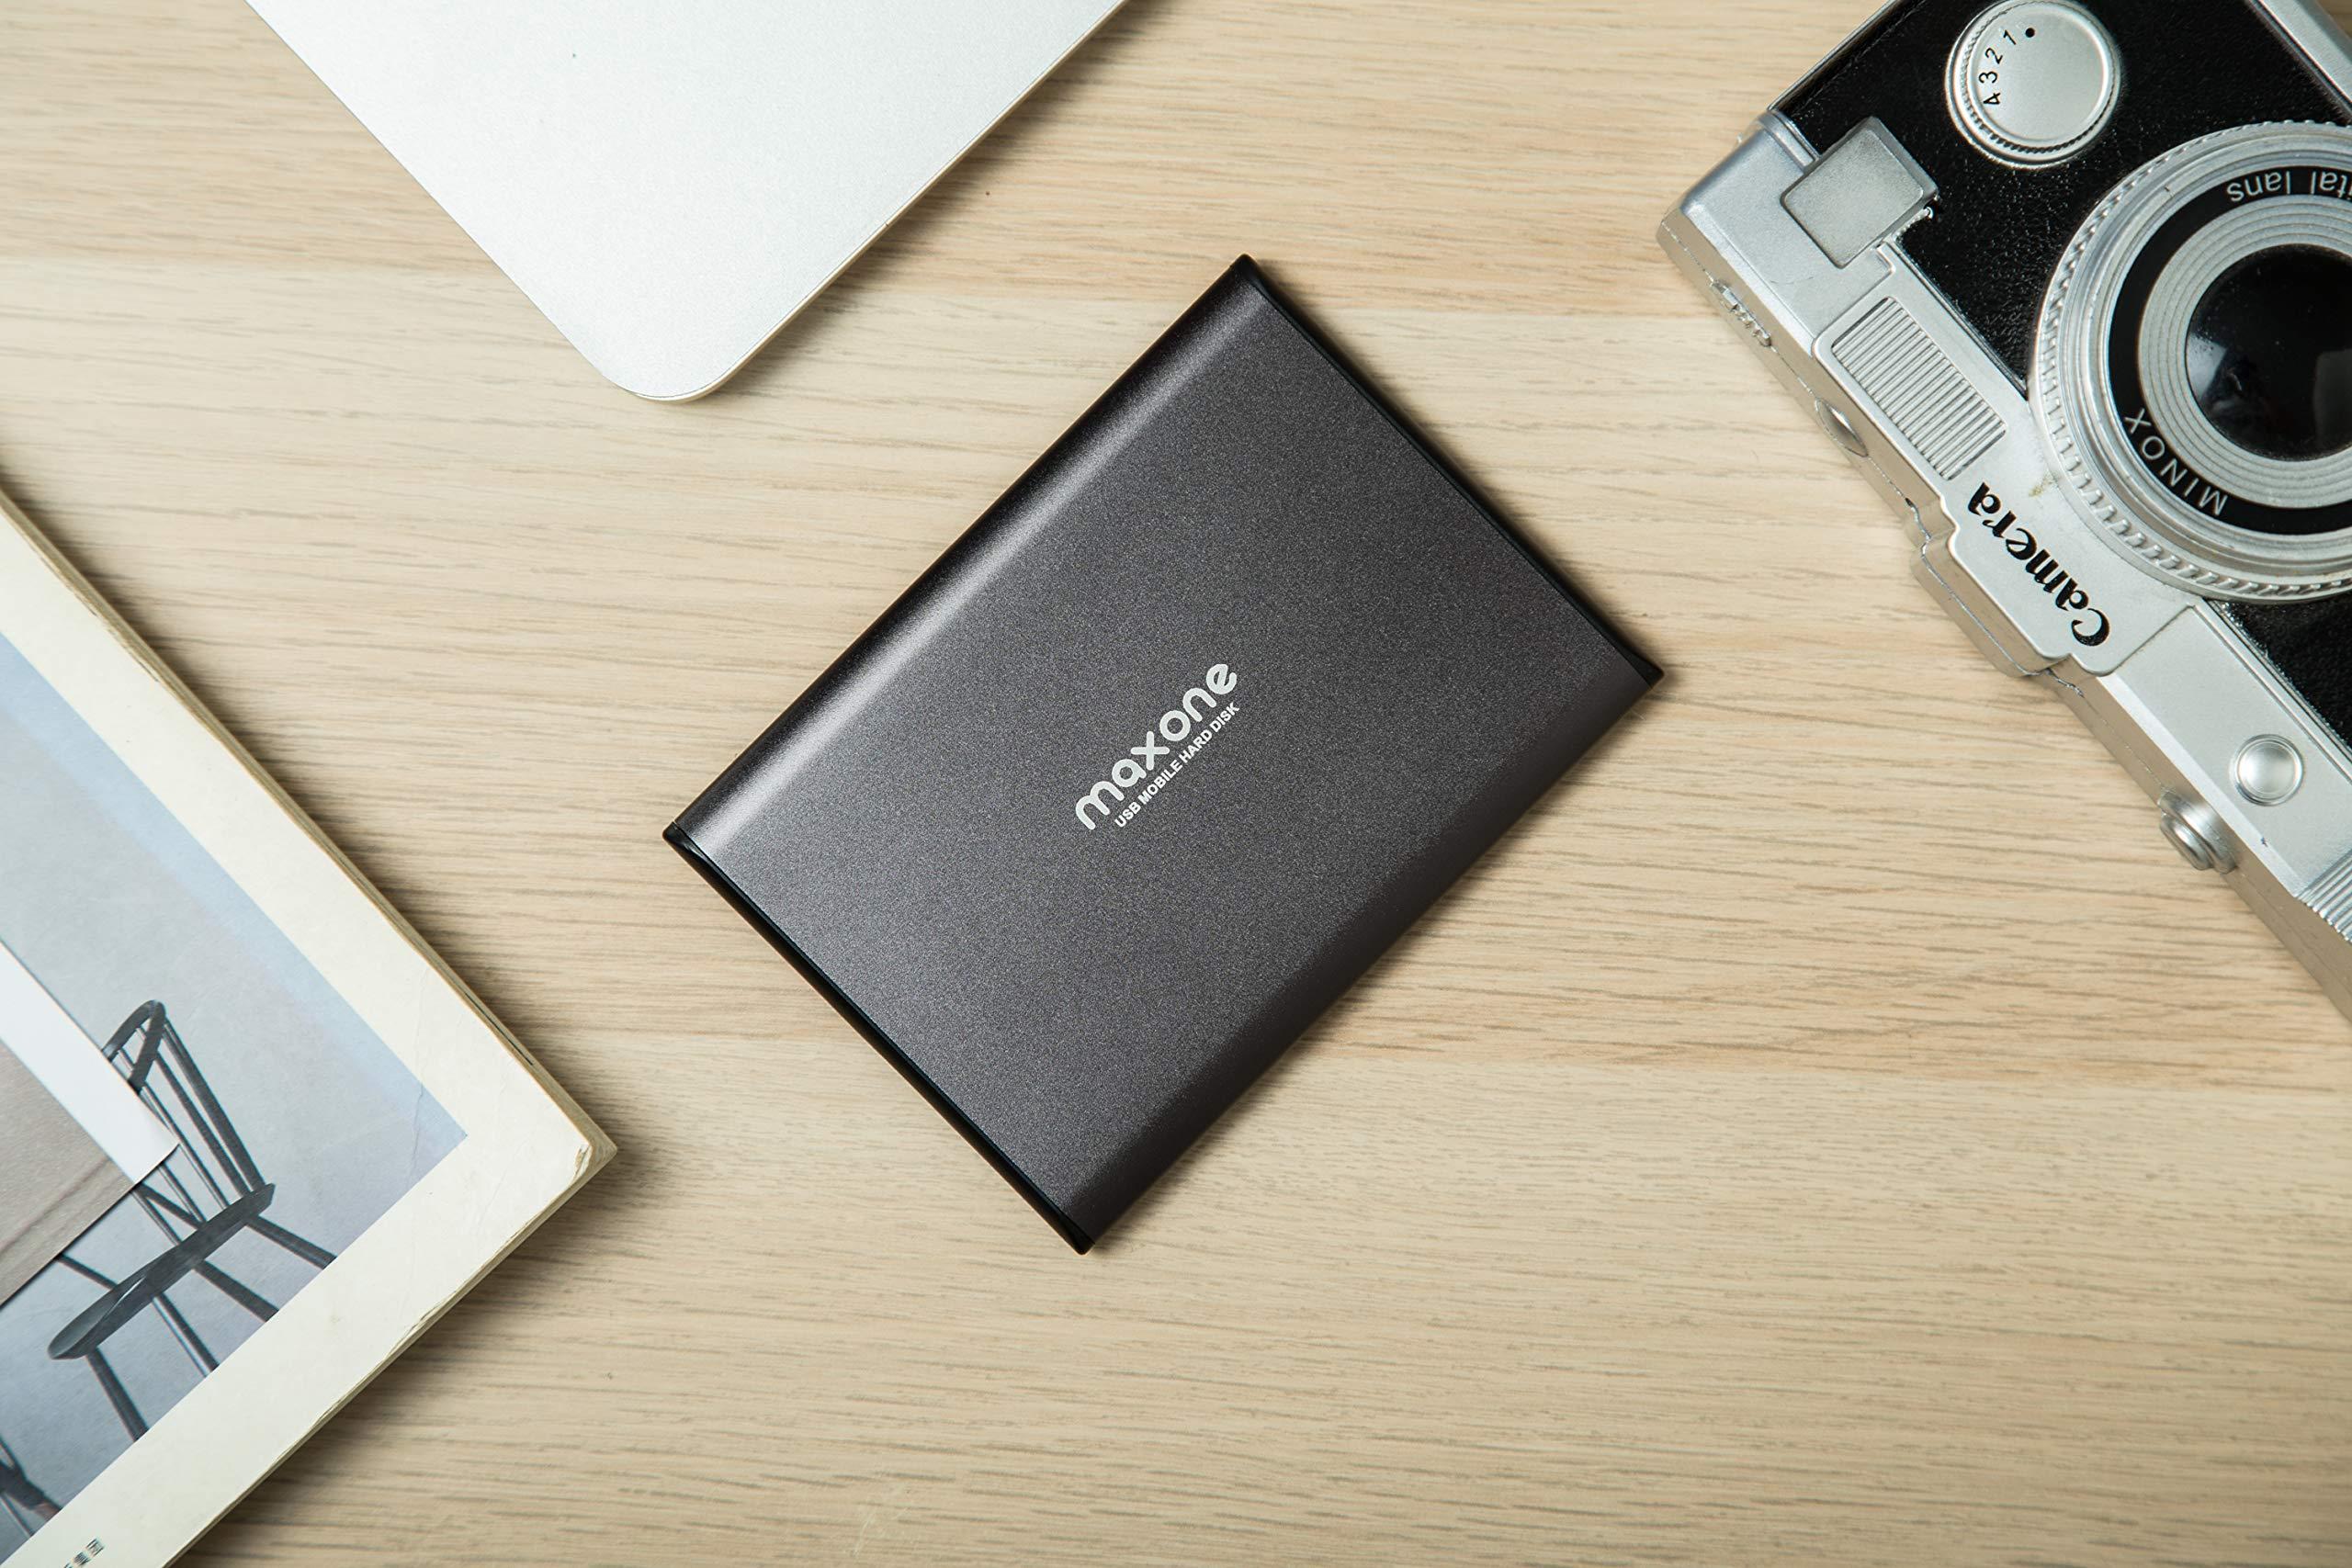 Hard Disk Esterno 160GB-2,5pollici ultrasottili HDD da USB 3.0 portatili per TV, PC, Mac, MacBook, Chromebook, Wii u, laptop, desktop, Windows (160GB, Charcoal)